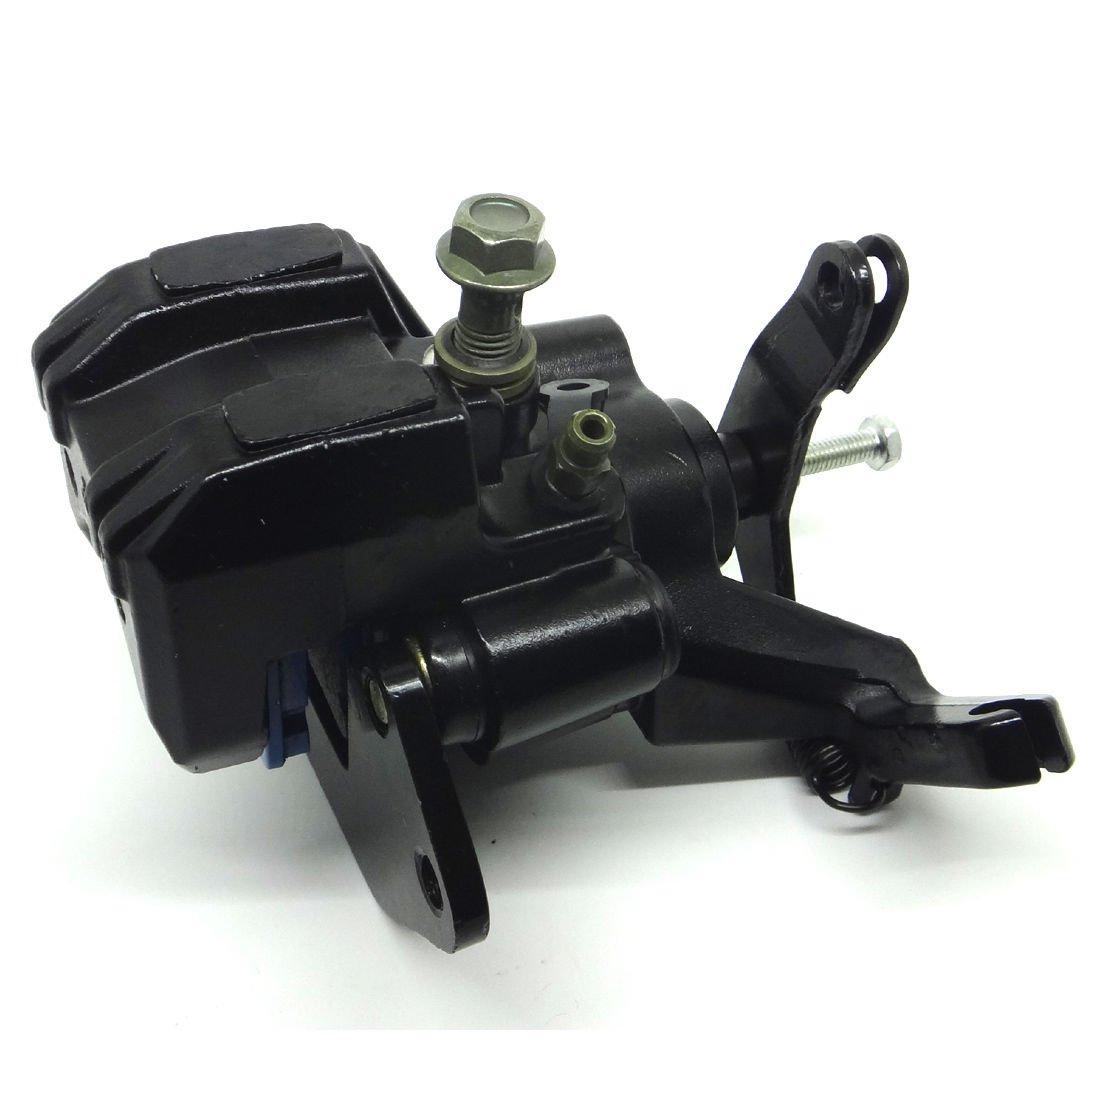 Amazon Conpus Rear Brake Caliper Assembly For Suzuki Lt230 Quadsport 230 Lt 230S 1985 1988 1986 Lt230S 2X4 Car Electronics